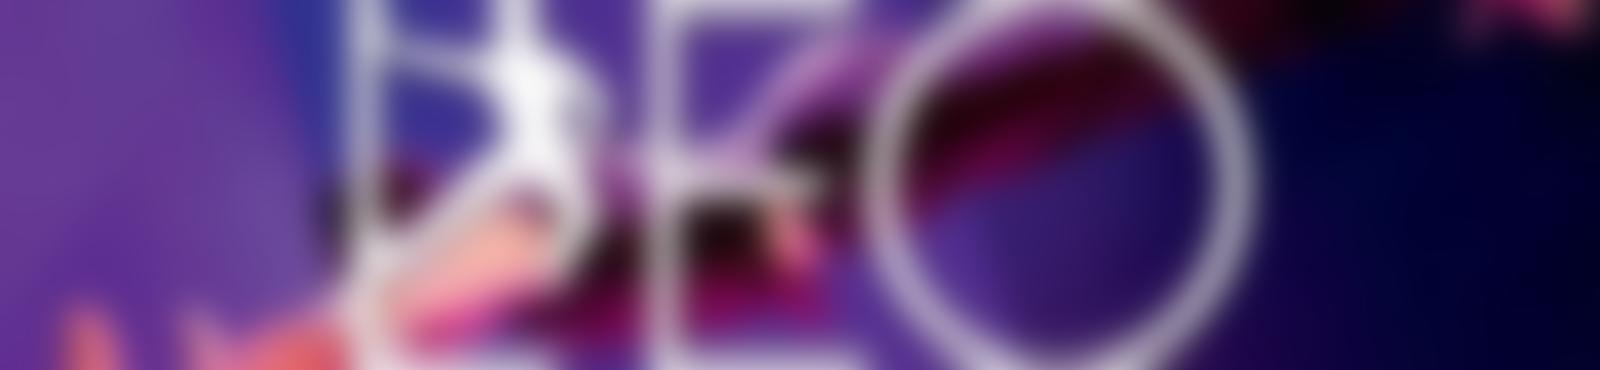 Blurred 76839cf9 3b1e 40ce bccb 94fed578871f